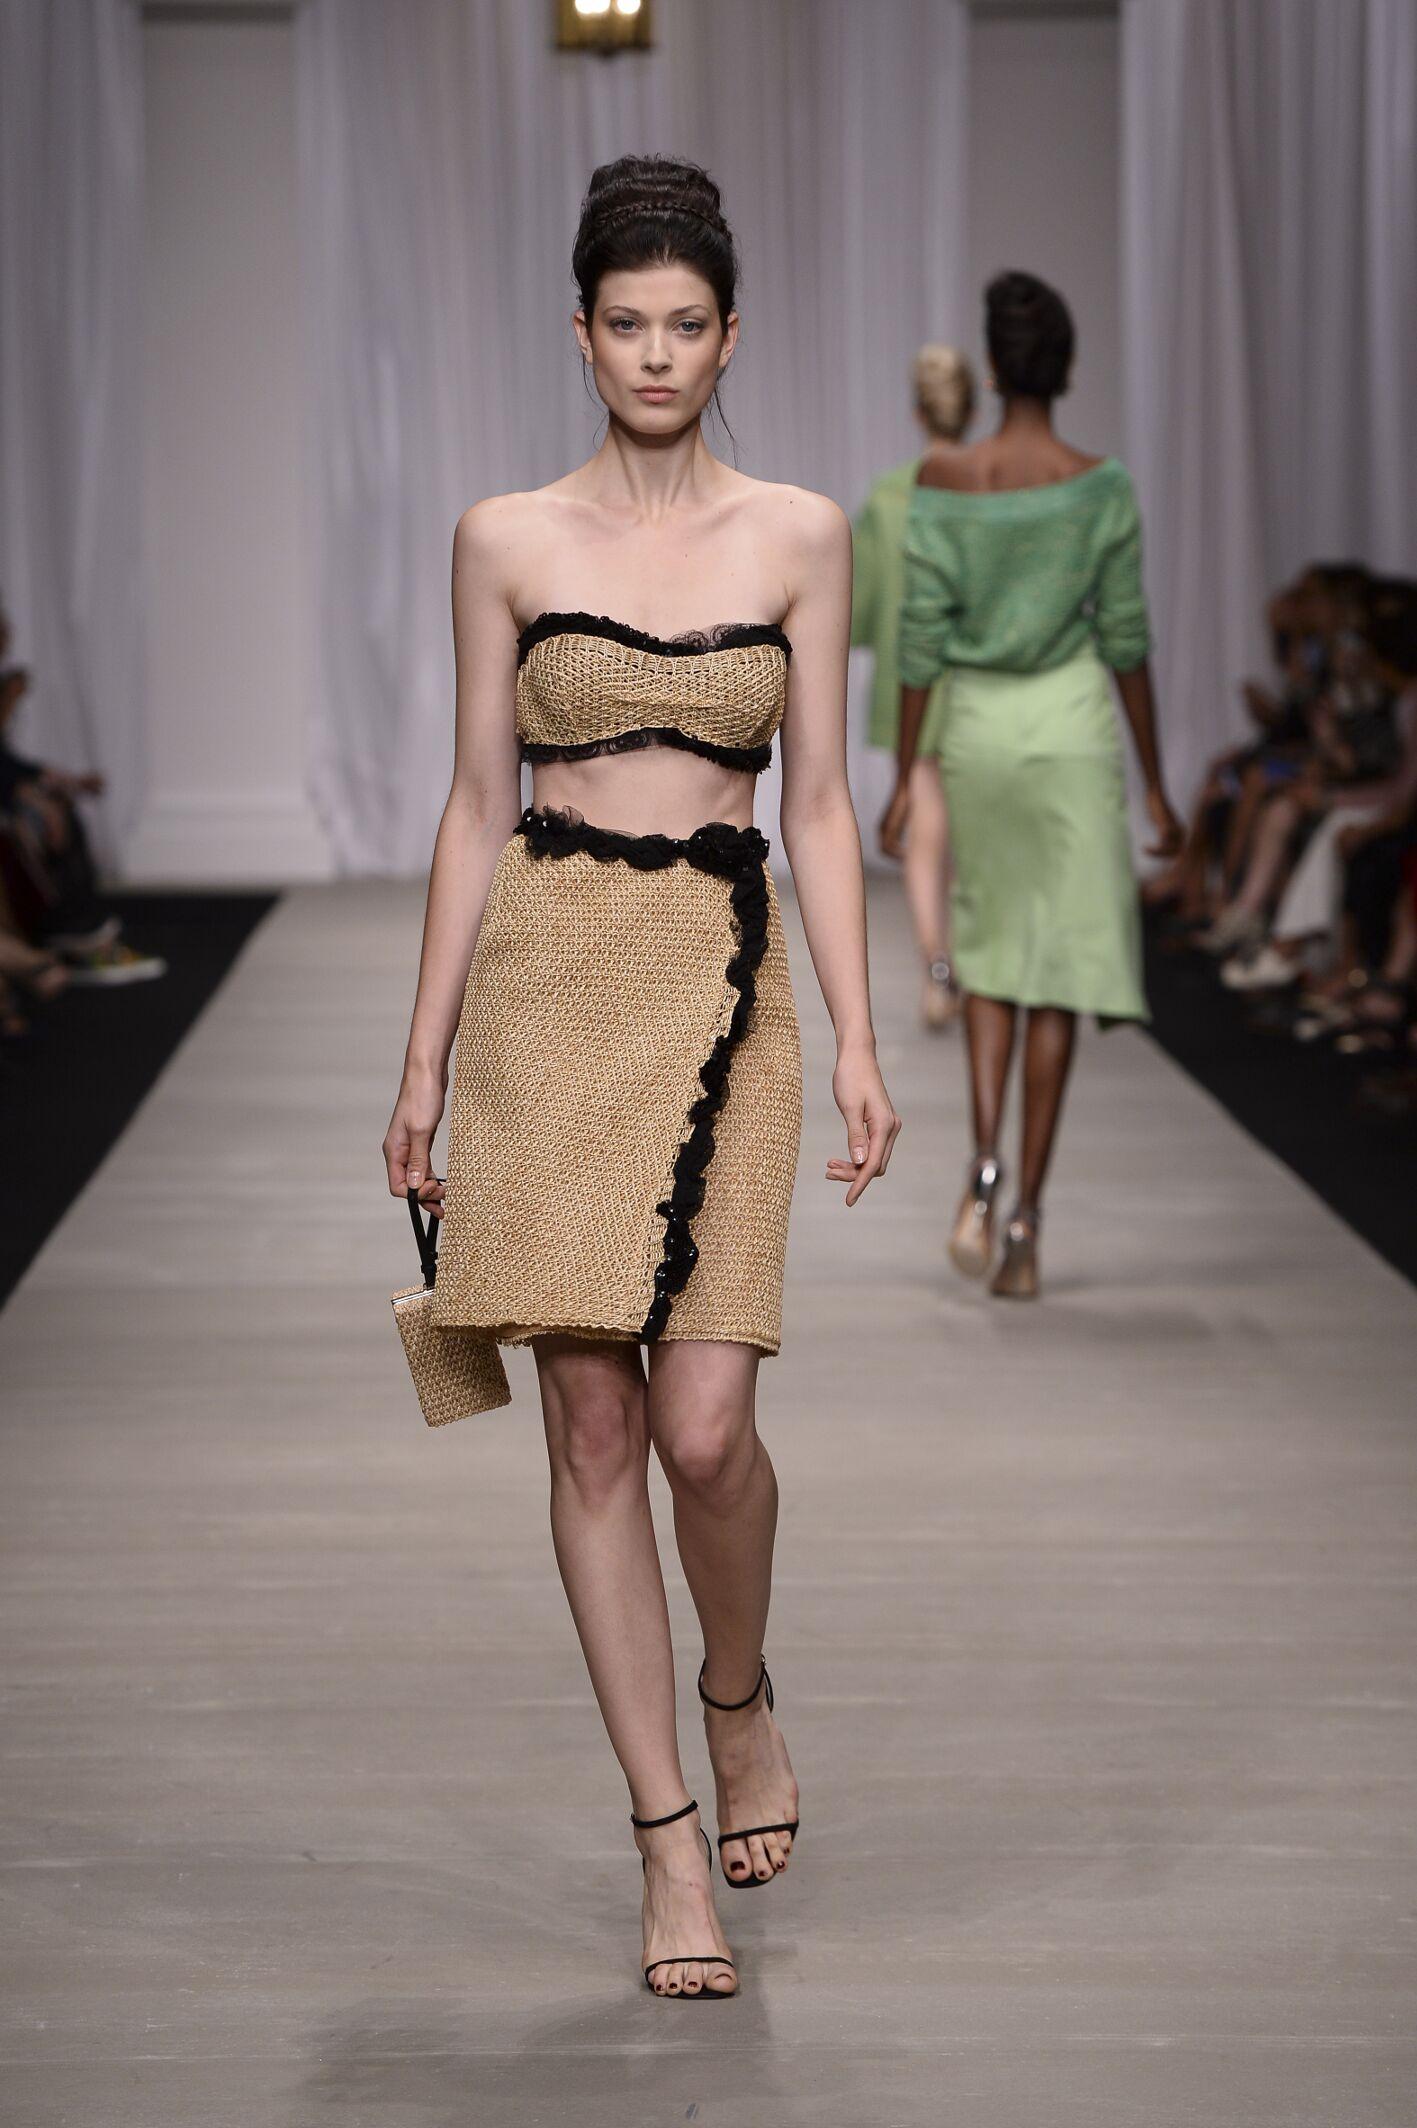 ERMANNO SCERVINO SPRING SUMMER 2015 WOMEN'S COLLECTION ...